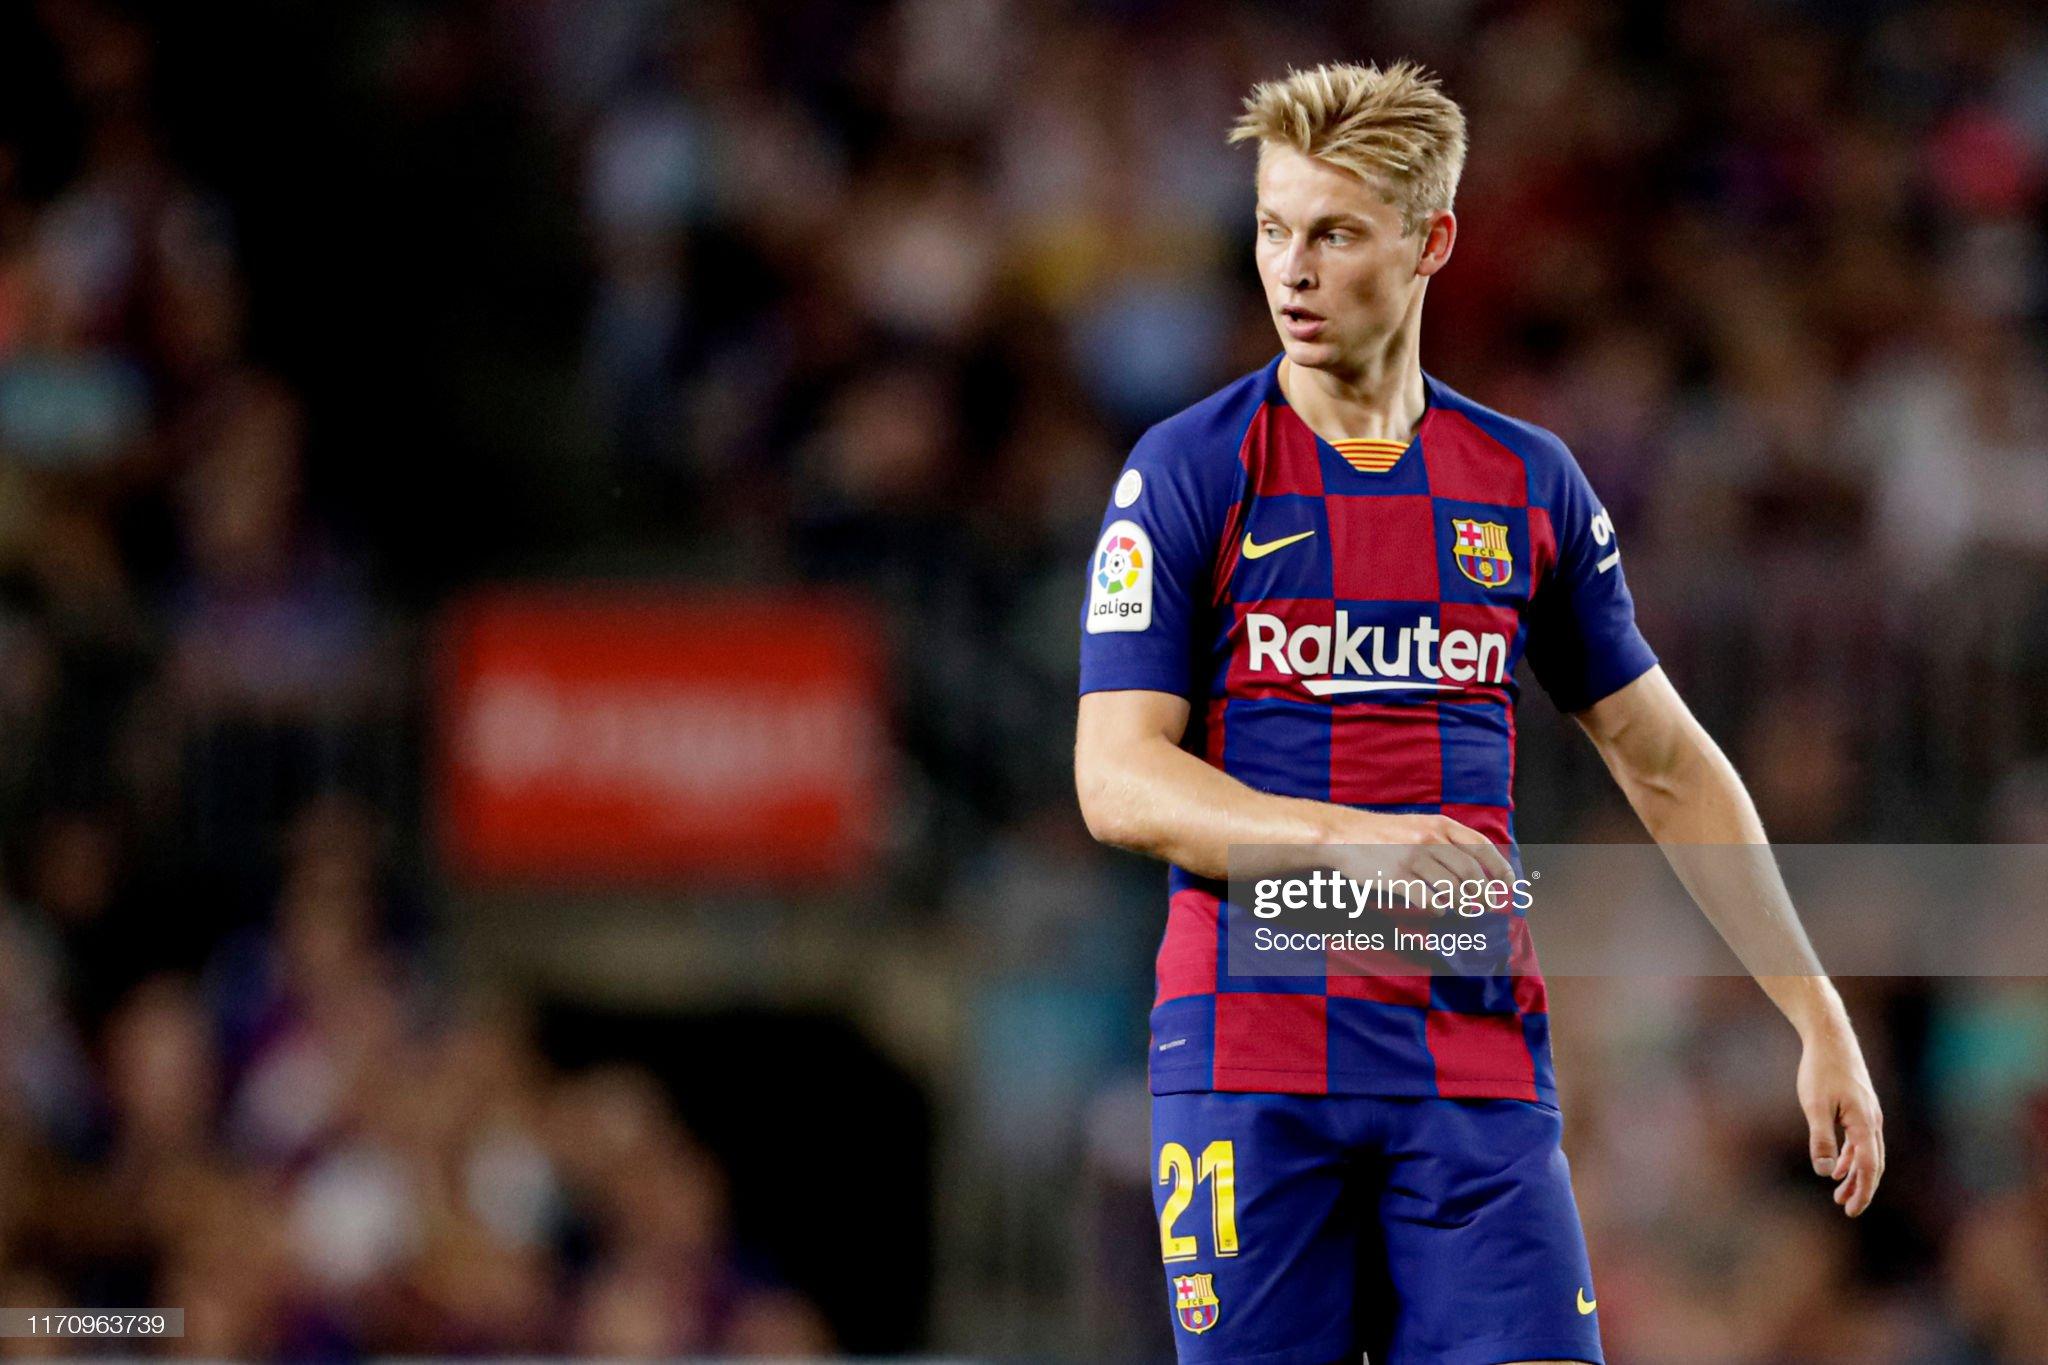 صور مباراة : برشلونة - فياريال 2-1 ( 24-09-2019 )  Frenkie-de-jong-of-fc-barcelona-during-the-la-liga-santander-match-picture-id1170963739?s=2048x2048